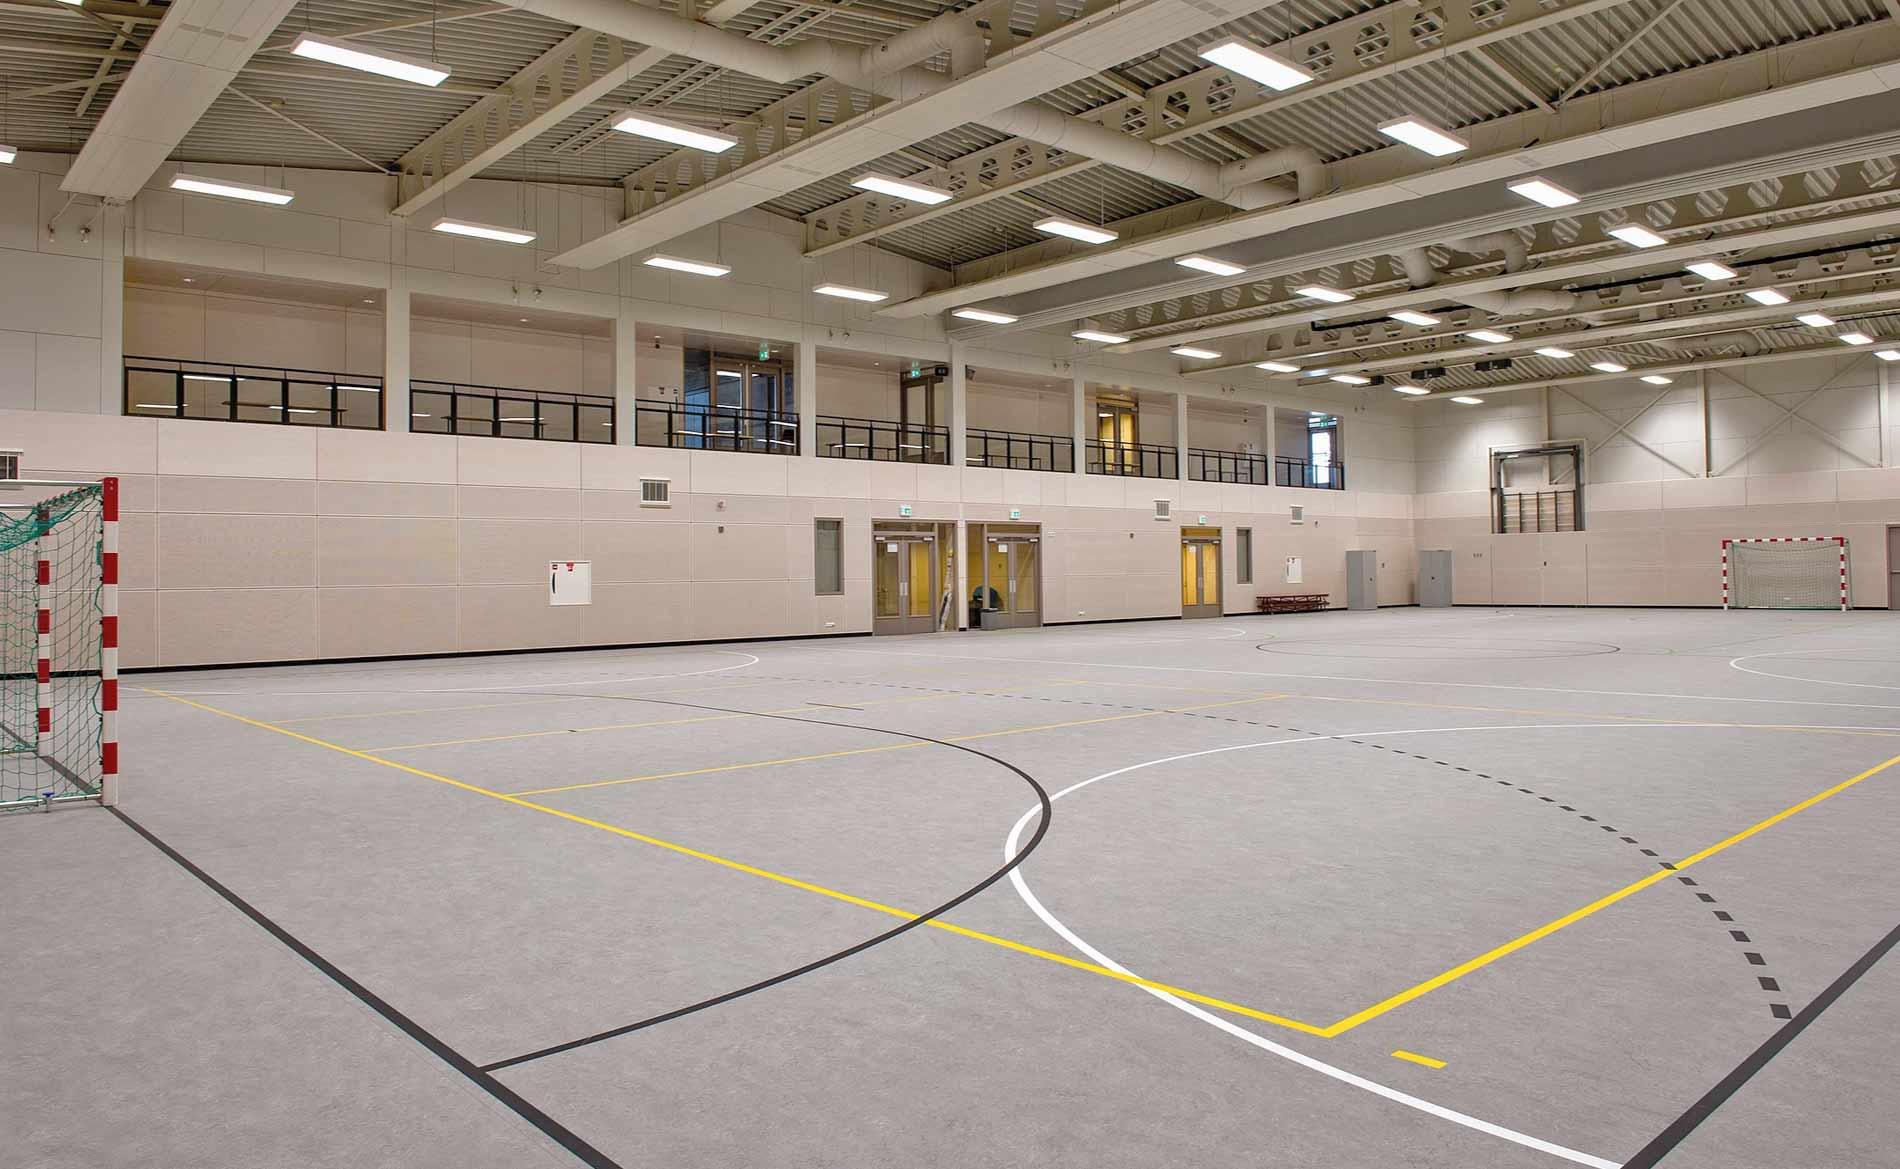 architect sporthal MFA multifunctionele sportaccommodatie De Dres Nibbixwoud BBHD architecten